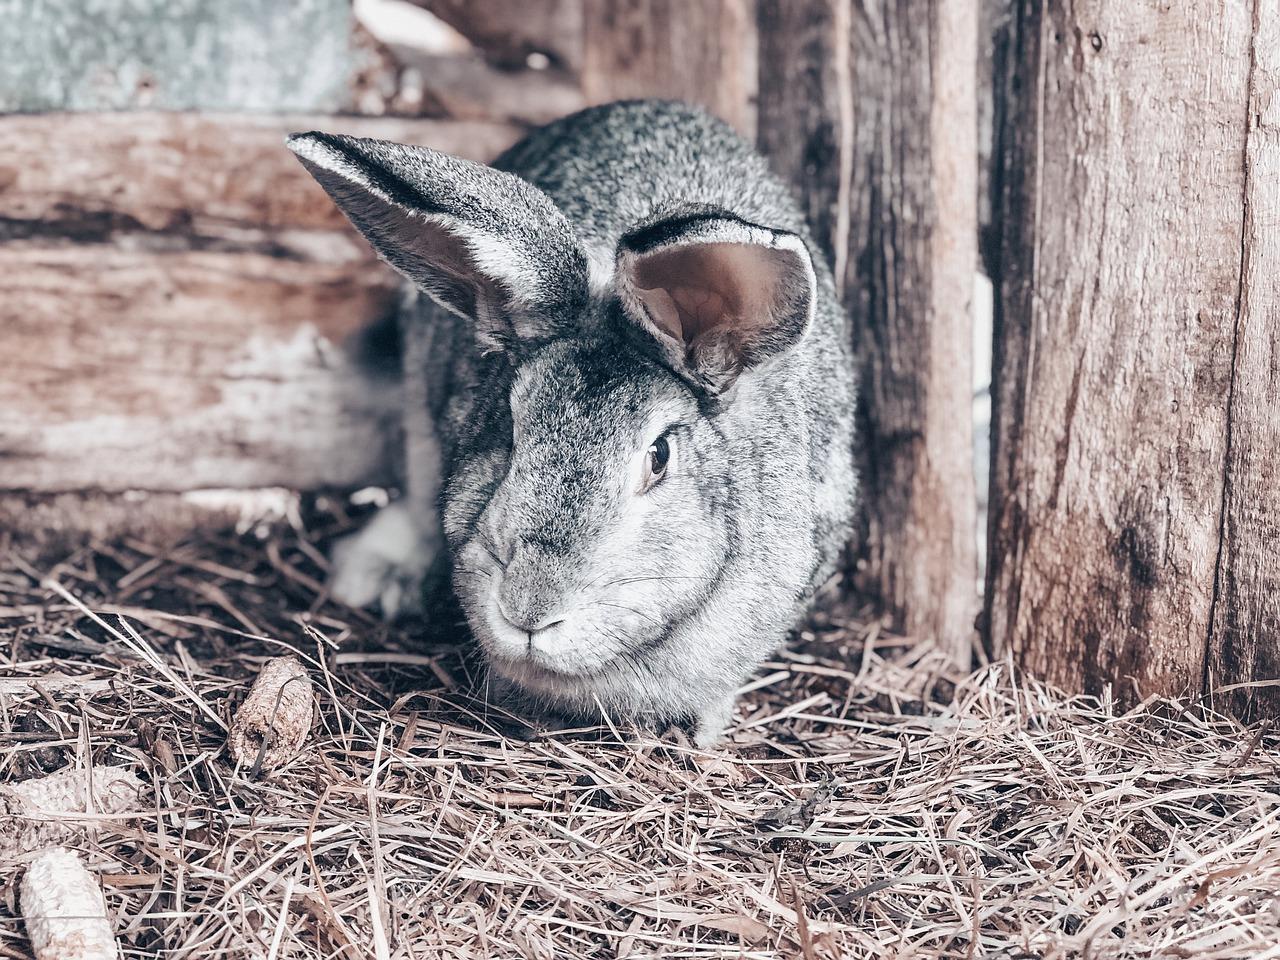 Hase Kaninchen Heu Stall Nager